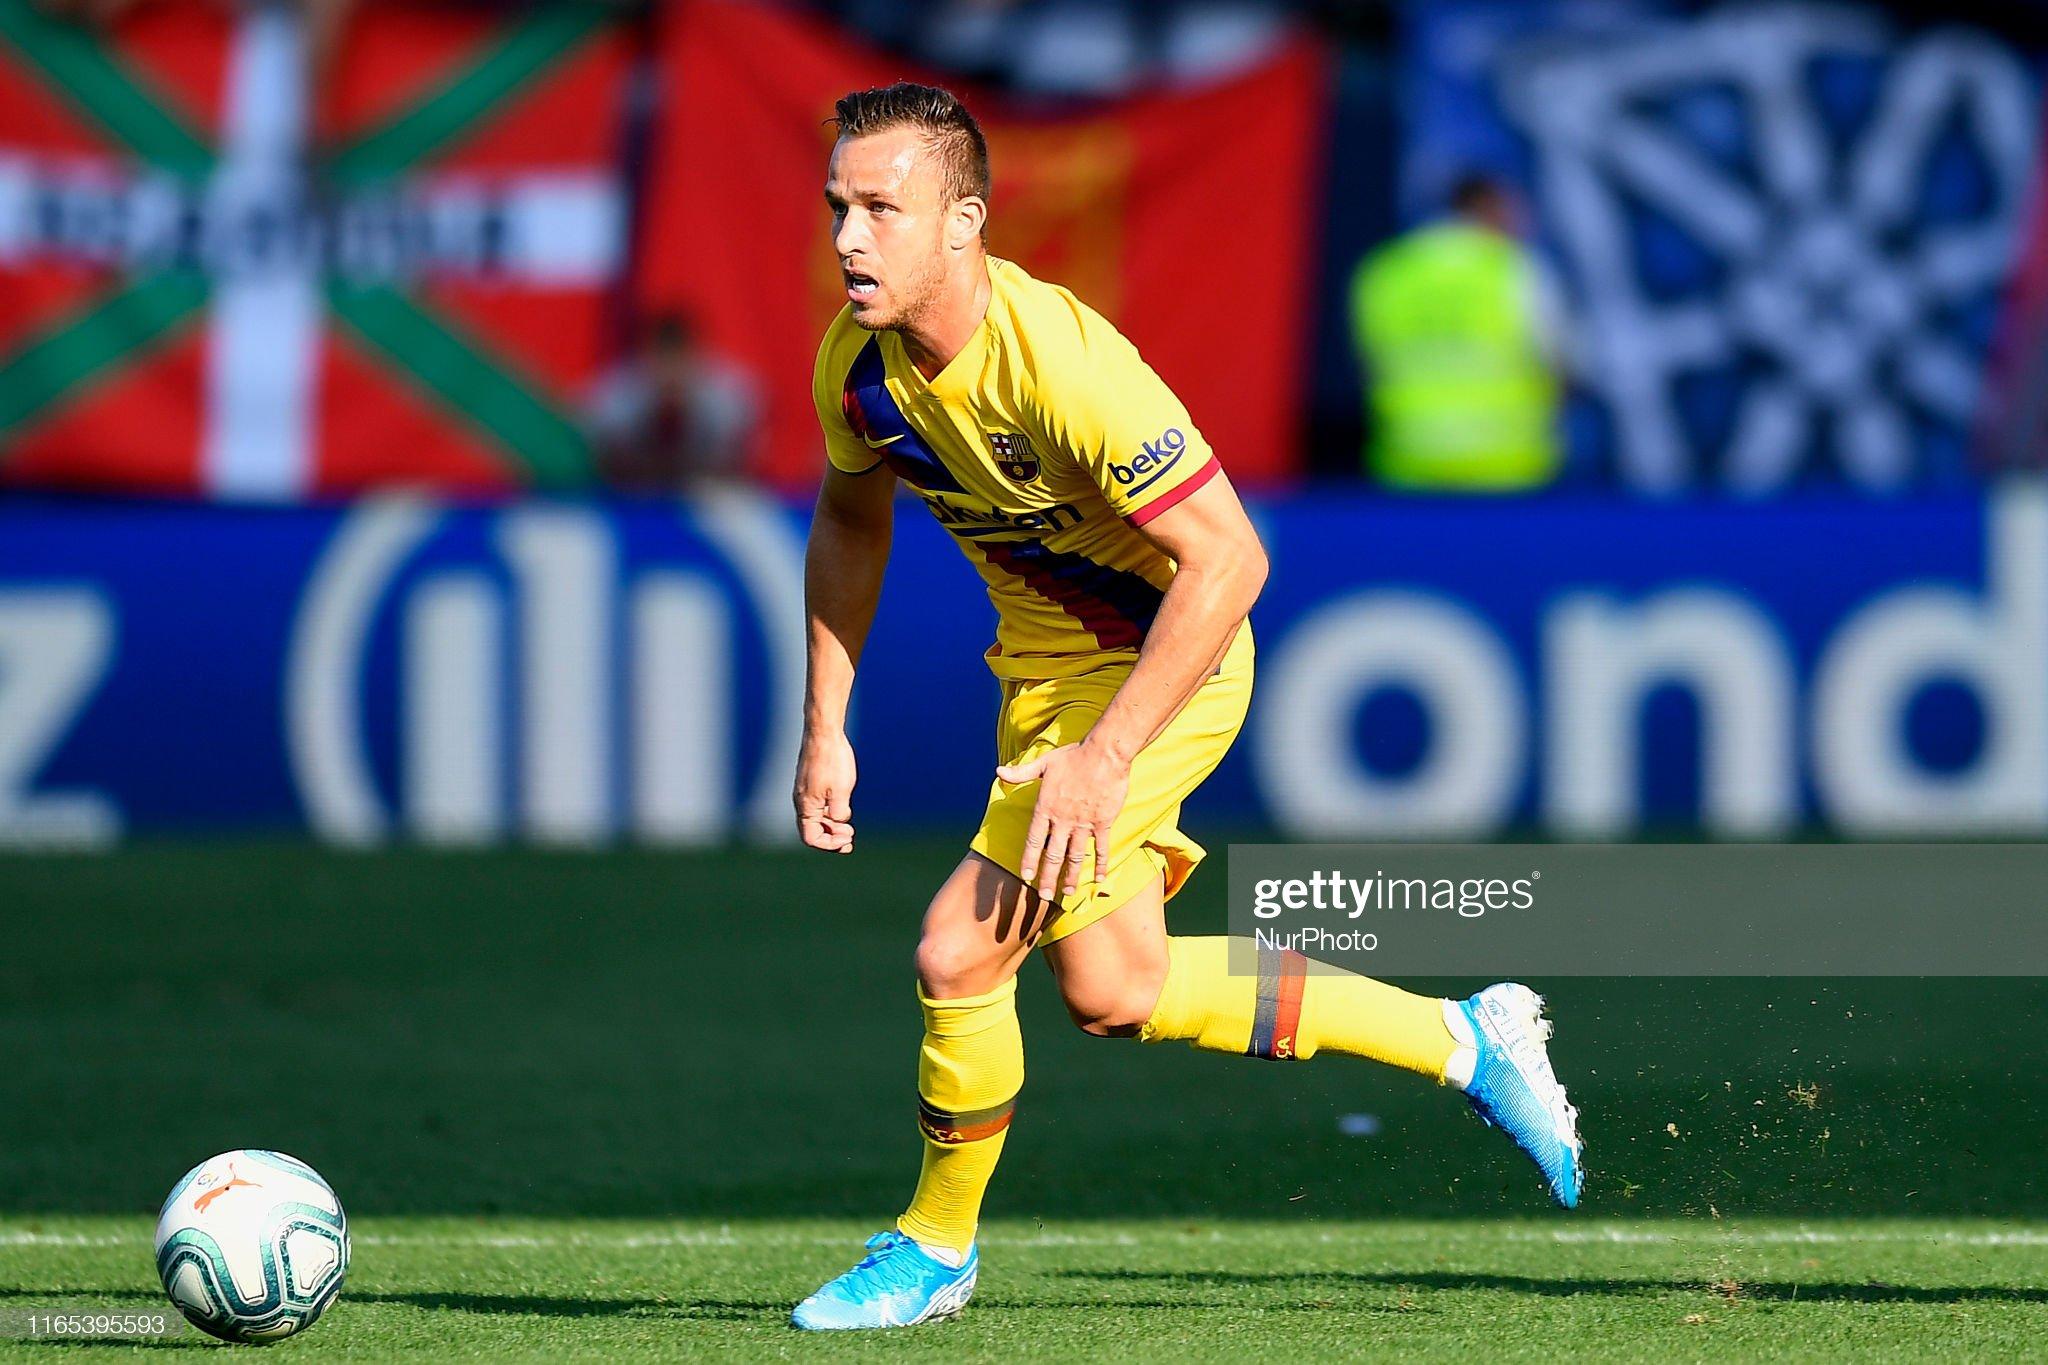 صور مباراة : أوساسونا - برشلونة 2-2 ( 31-08-2019 )  Arthur-melo-of-barcelona-in-aciton-during-the-liga-match-between-ca-picture-id1165395593?s=2048x2048